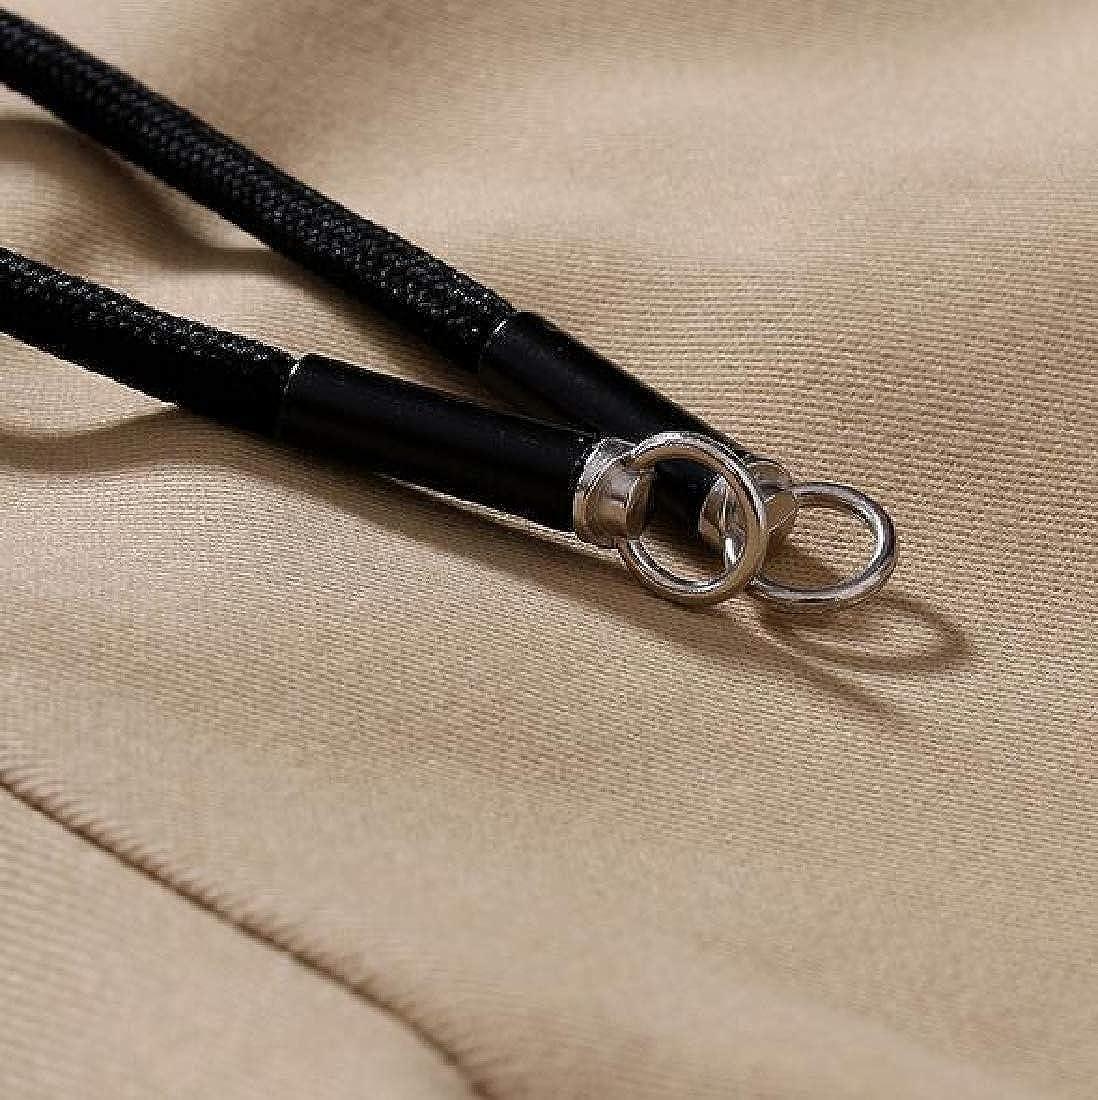 MOUTEN Mens Pockets Cargo Pants Cotton Casual Elastic Waisted Jogger Pants